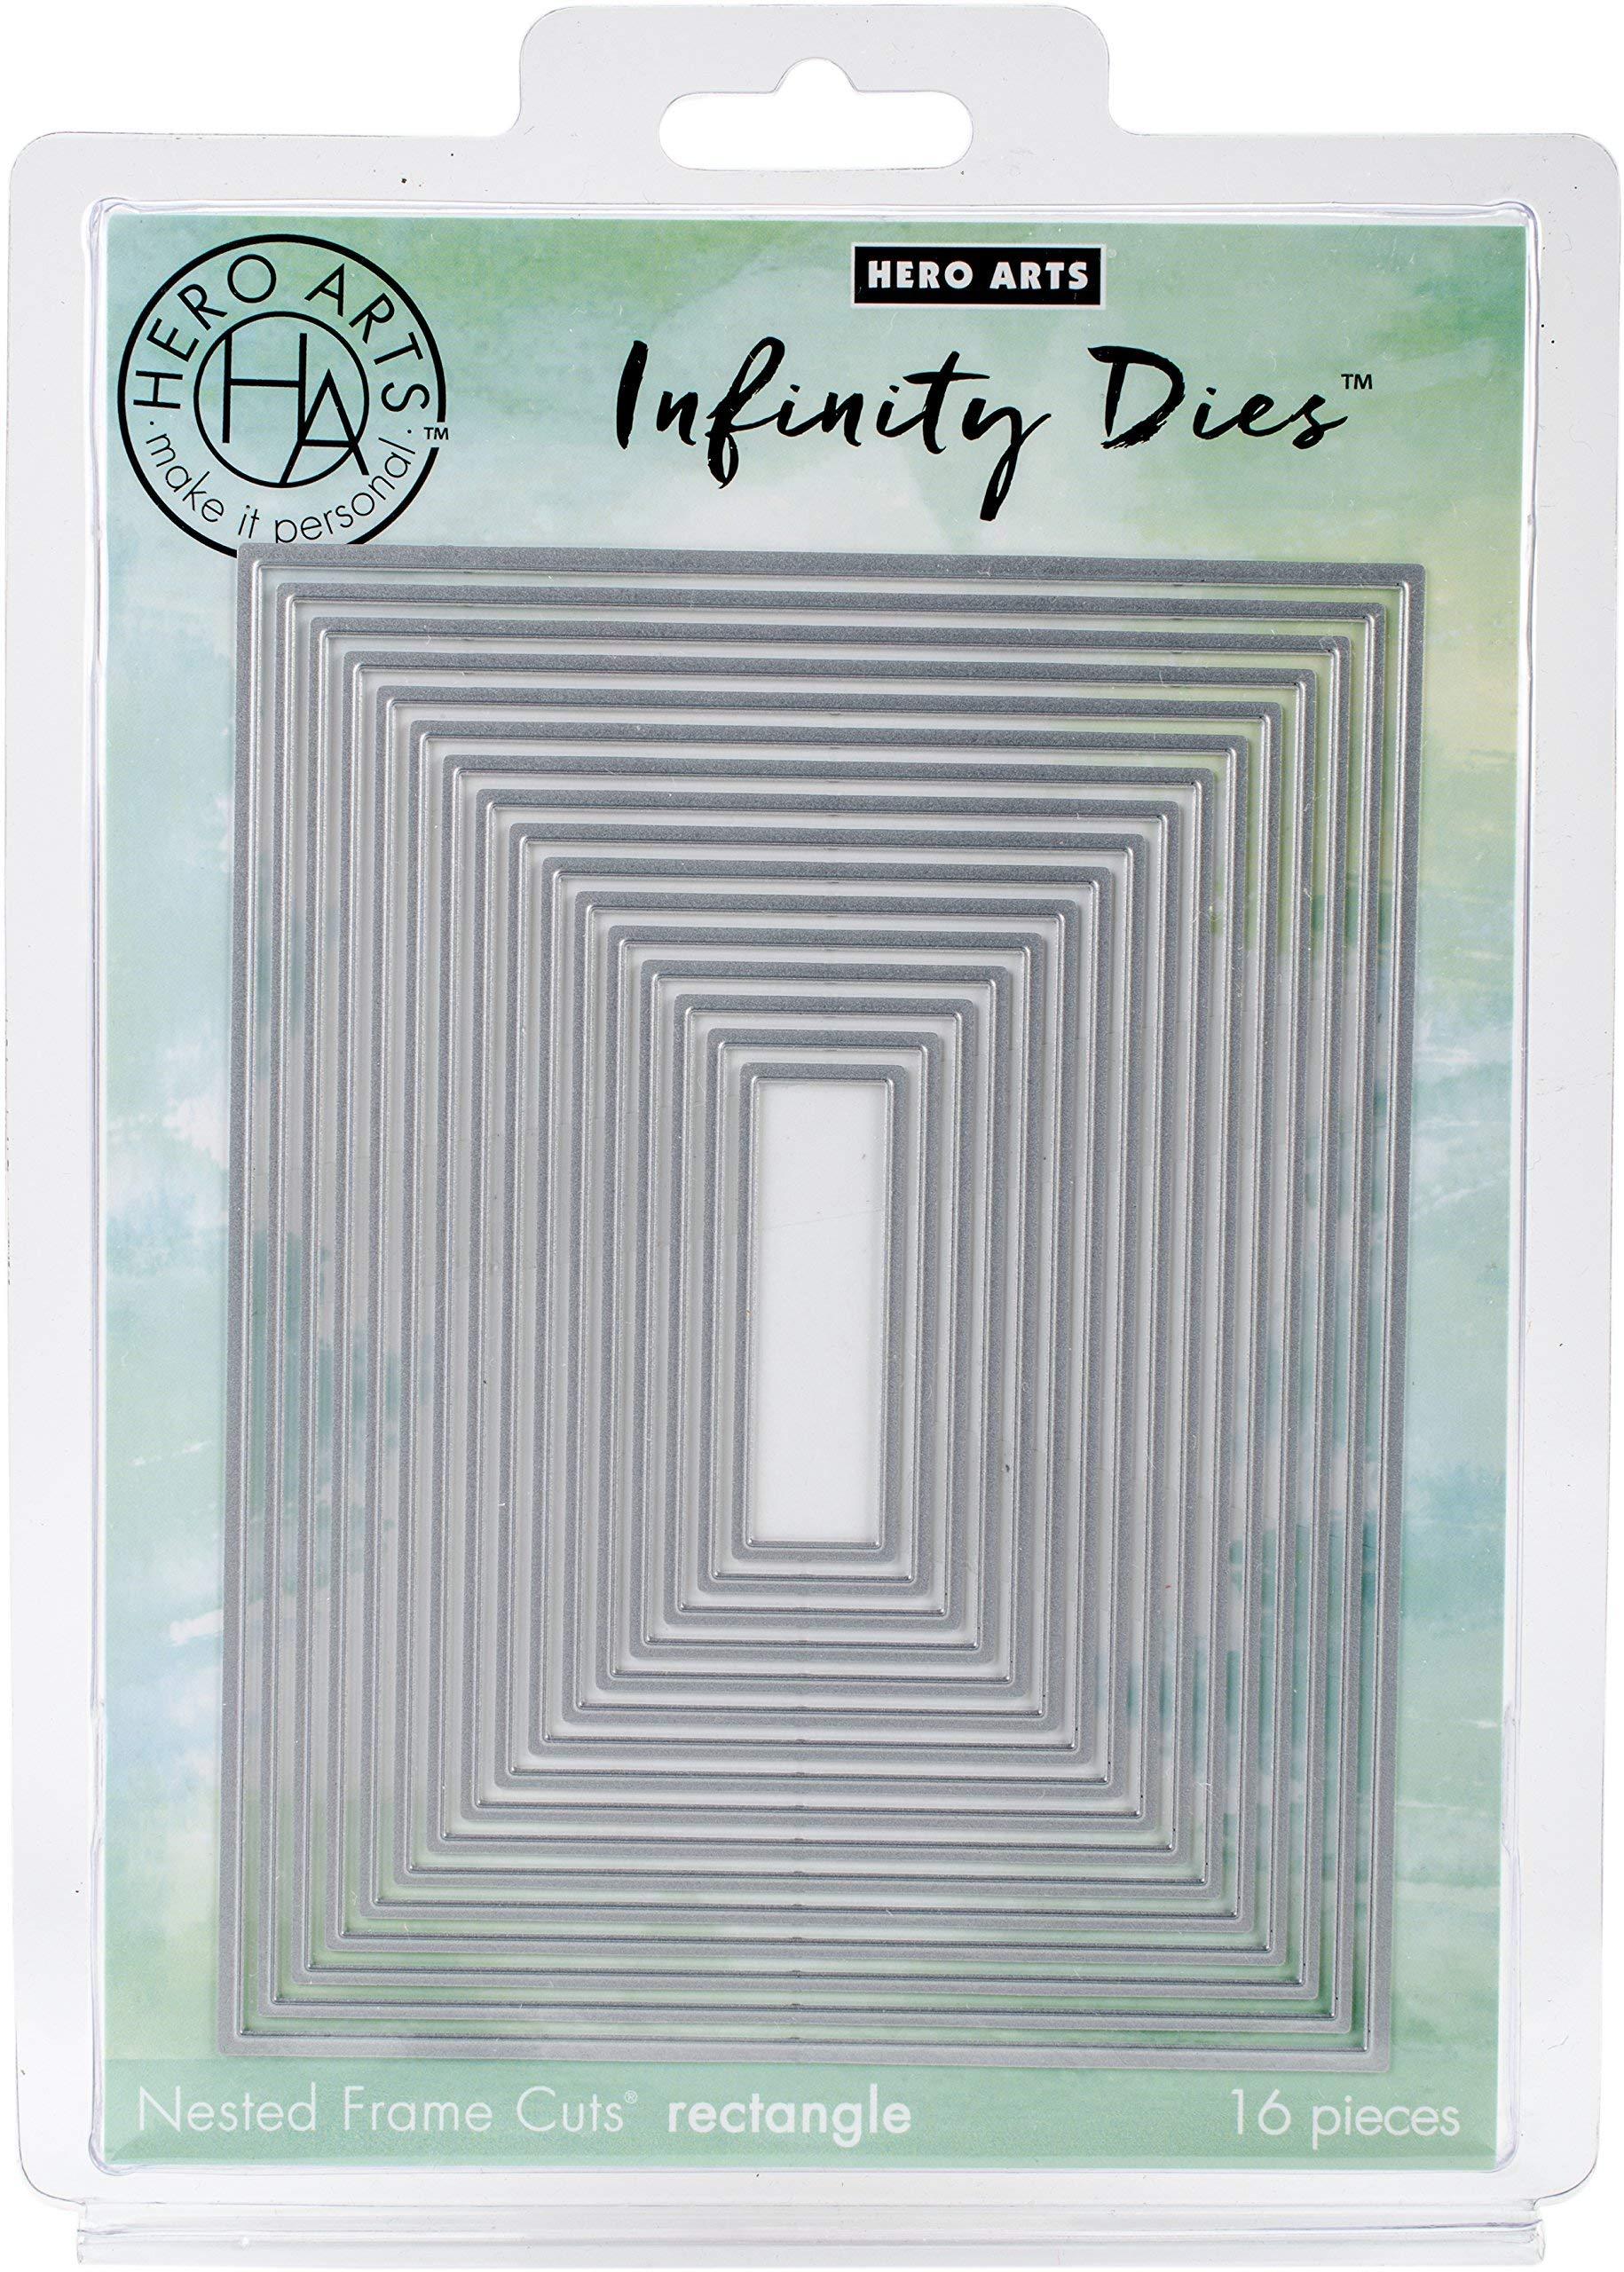 Hero Arts DI198 Card Making Cutting Dies, Infinity Die Cuts Set - Nesting Rectangle